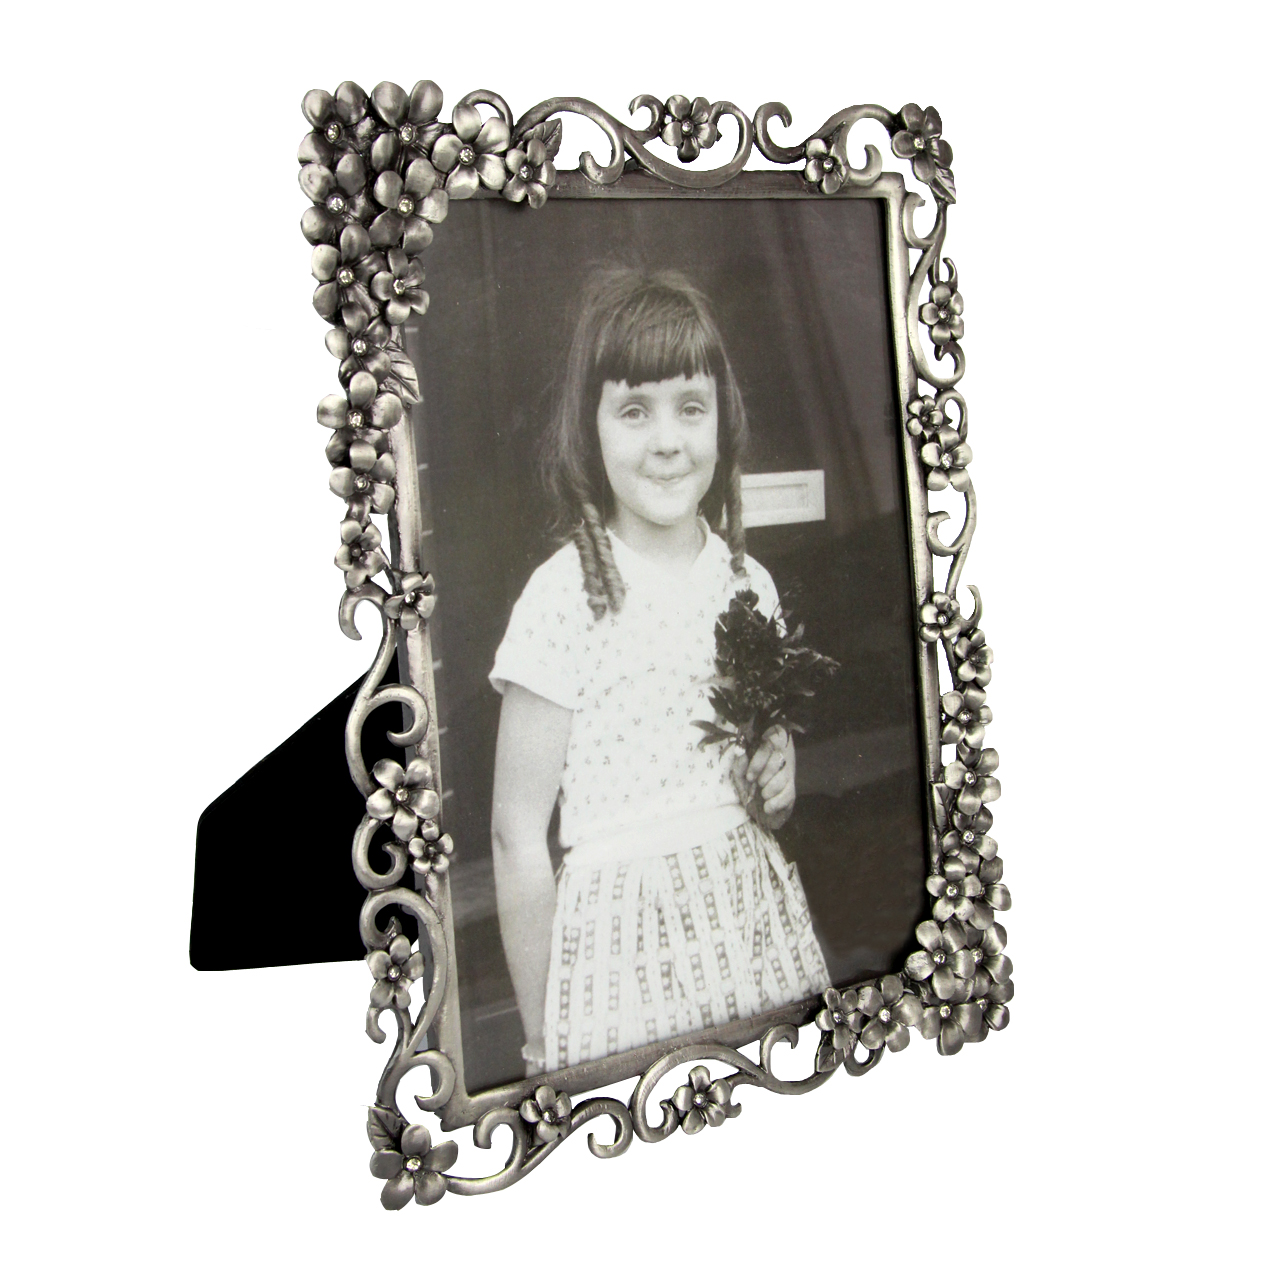 Rama Foto Din Metal Argintiu Cu Flori Si Pietre 19.5x24 Cm